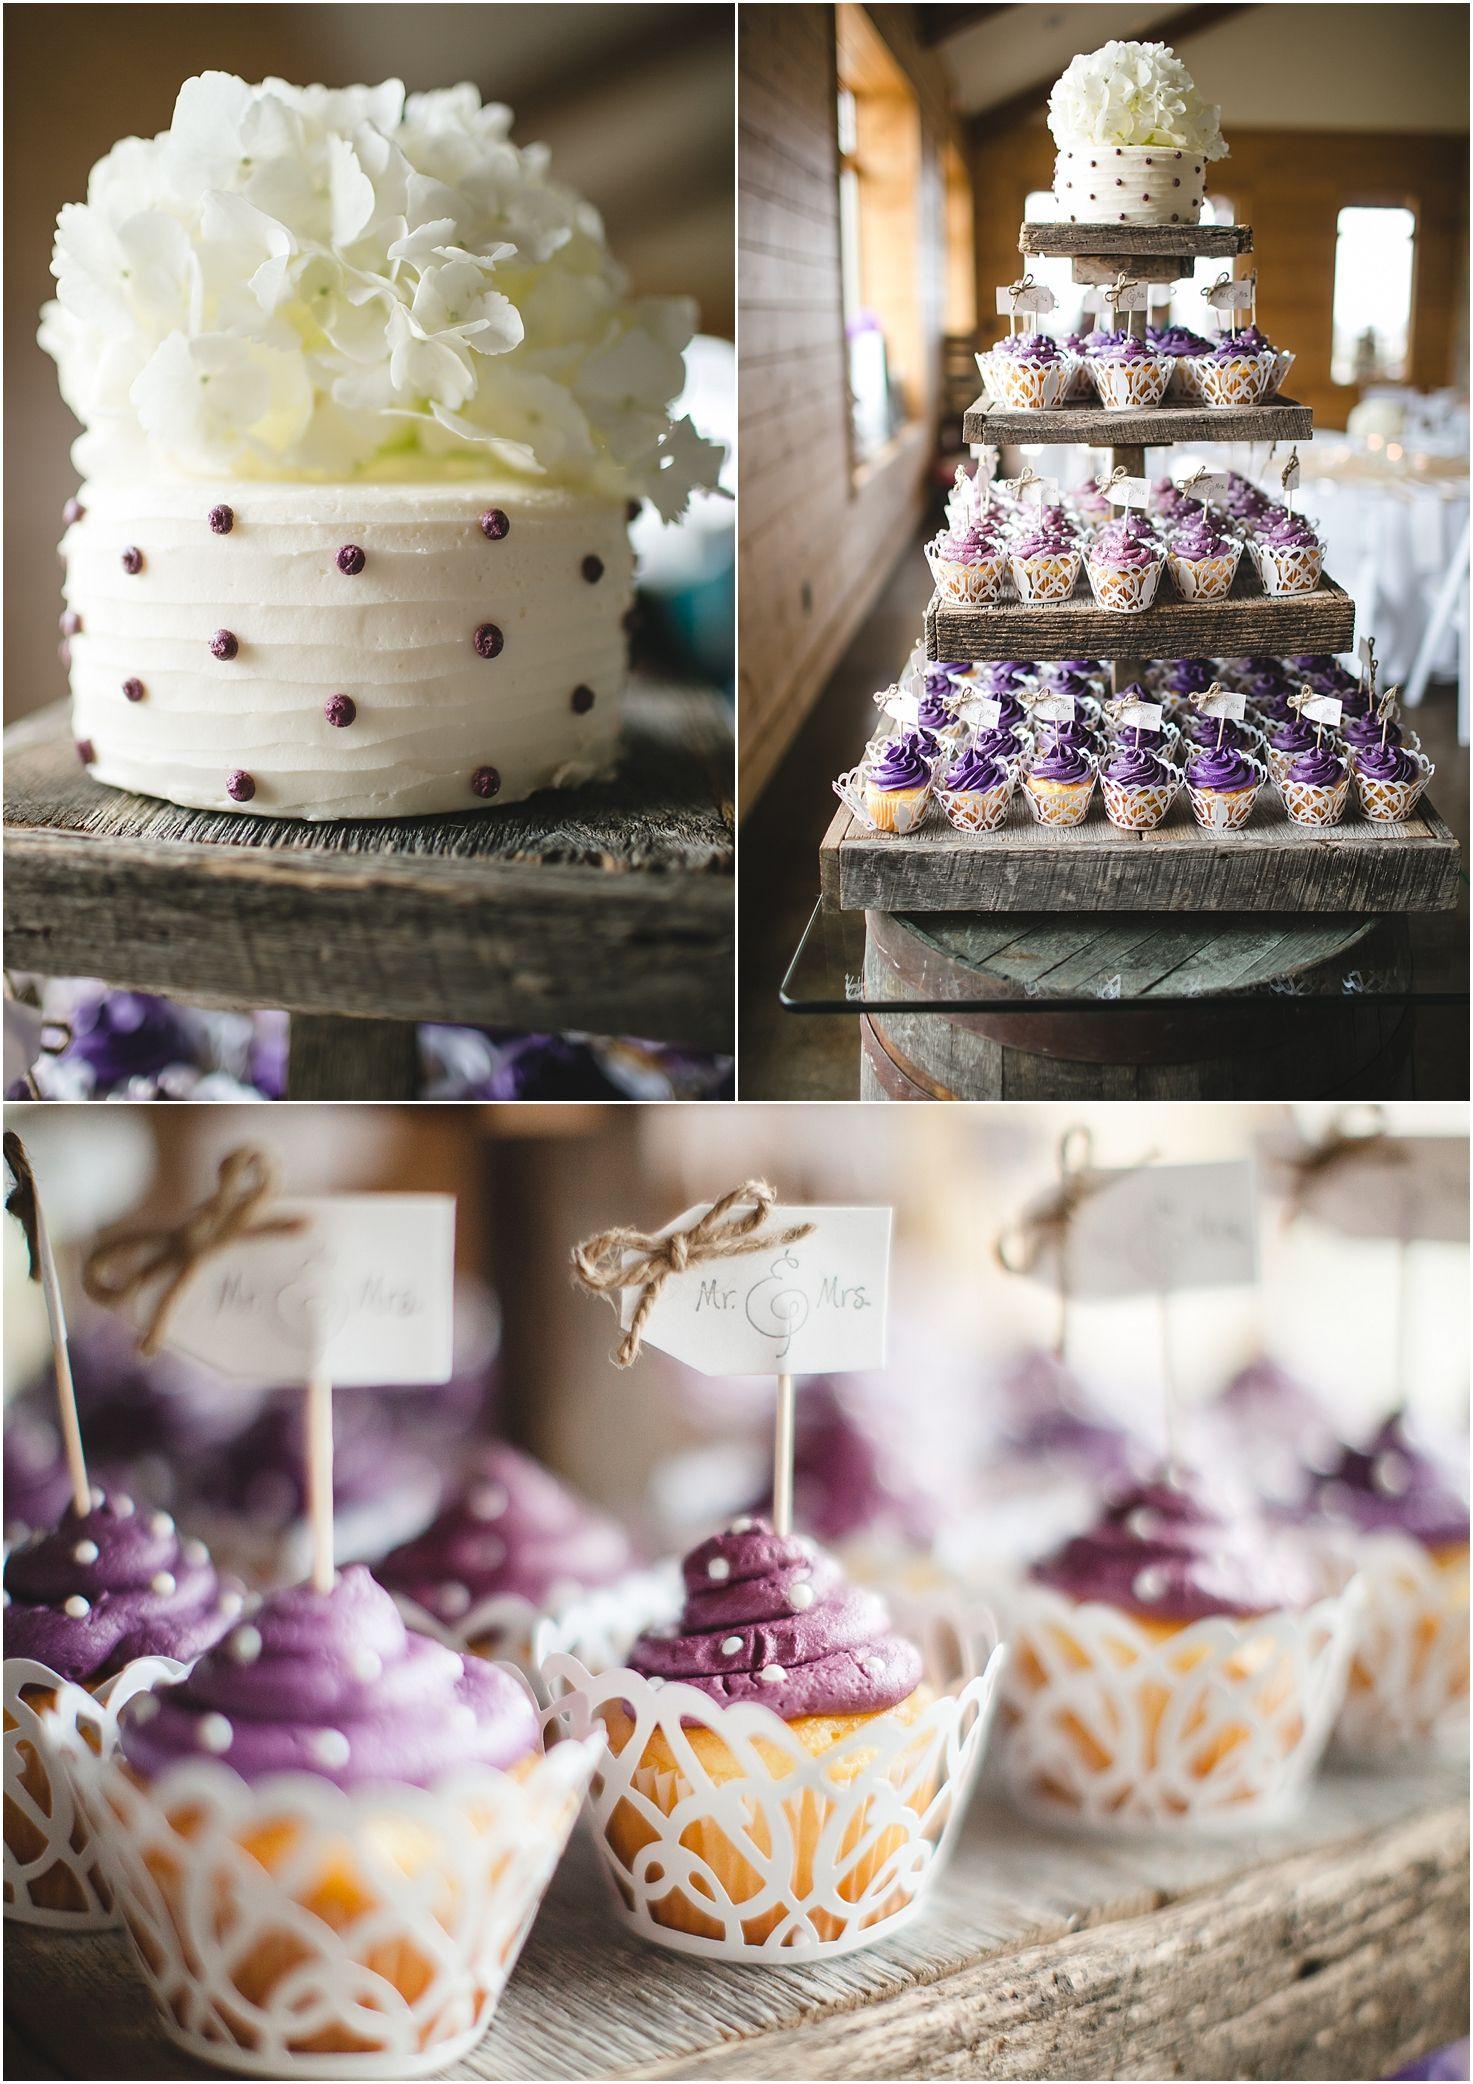 Chelsea & Cody Wedding cupcakes, Wedding cakes with